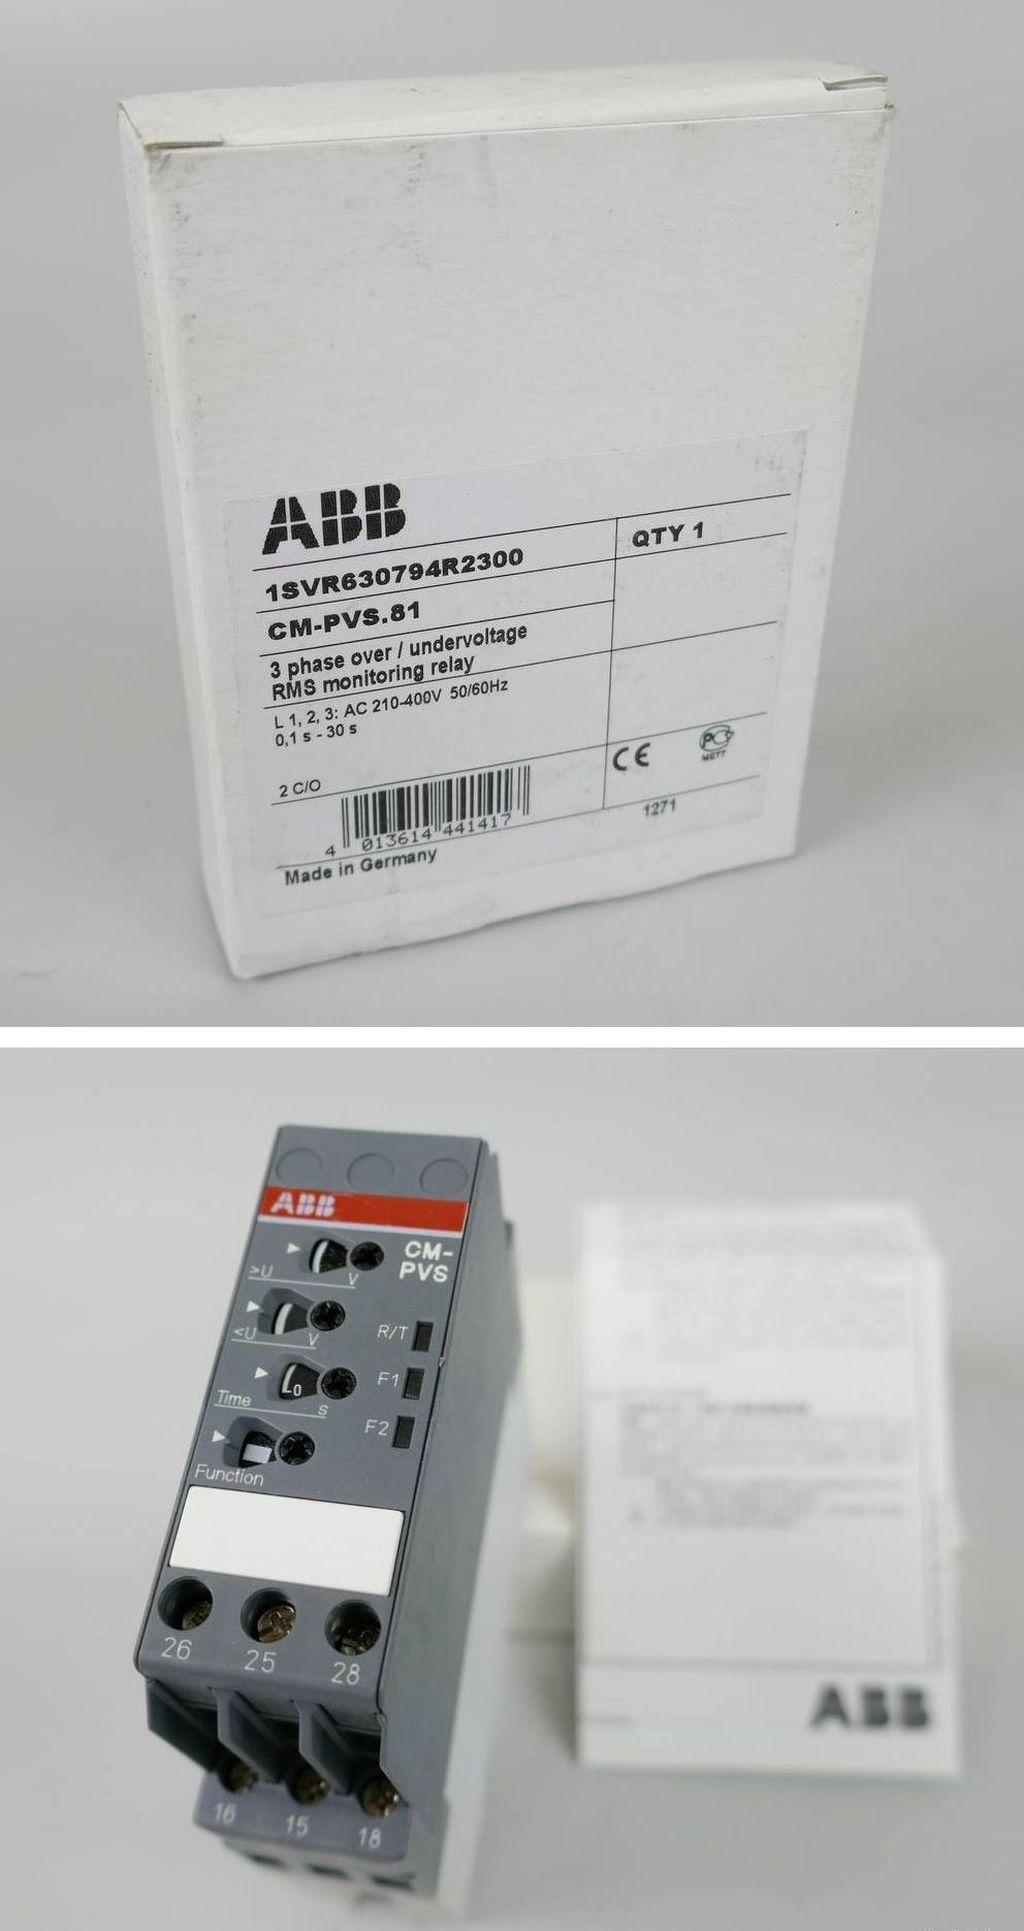 PP3973 Netzüberwachungsrelais ABB CM-PVS.81 1SVR630794R2300